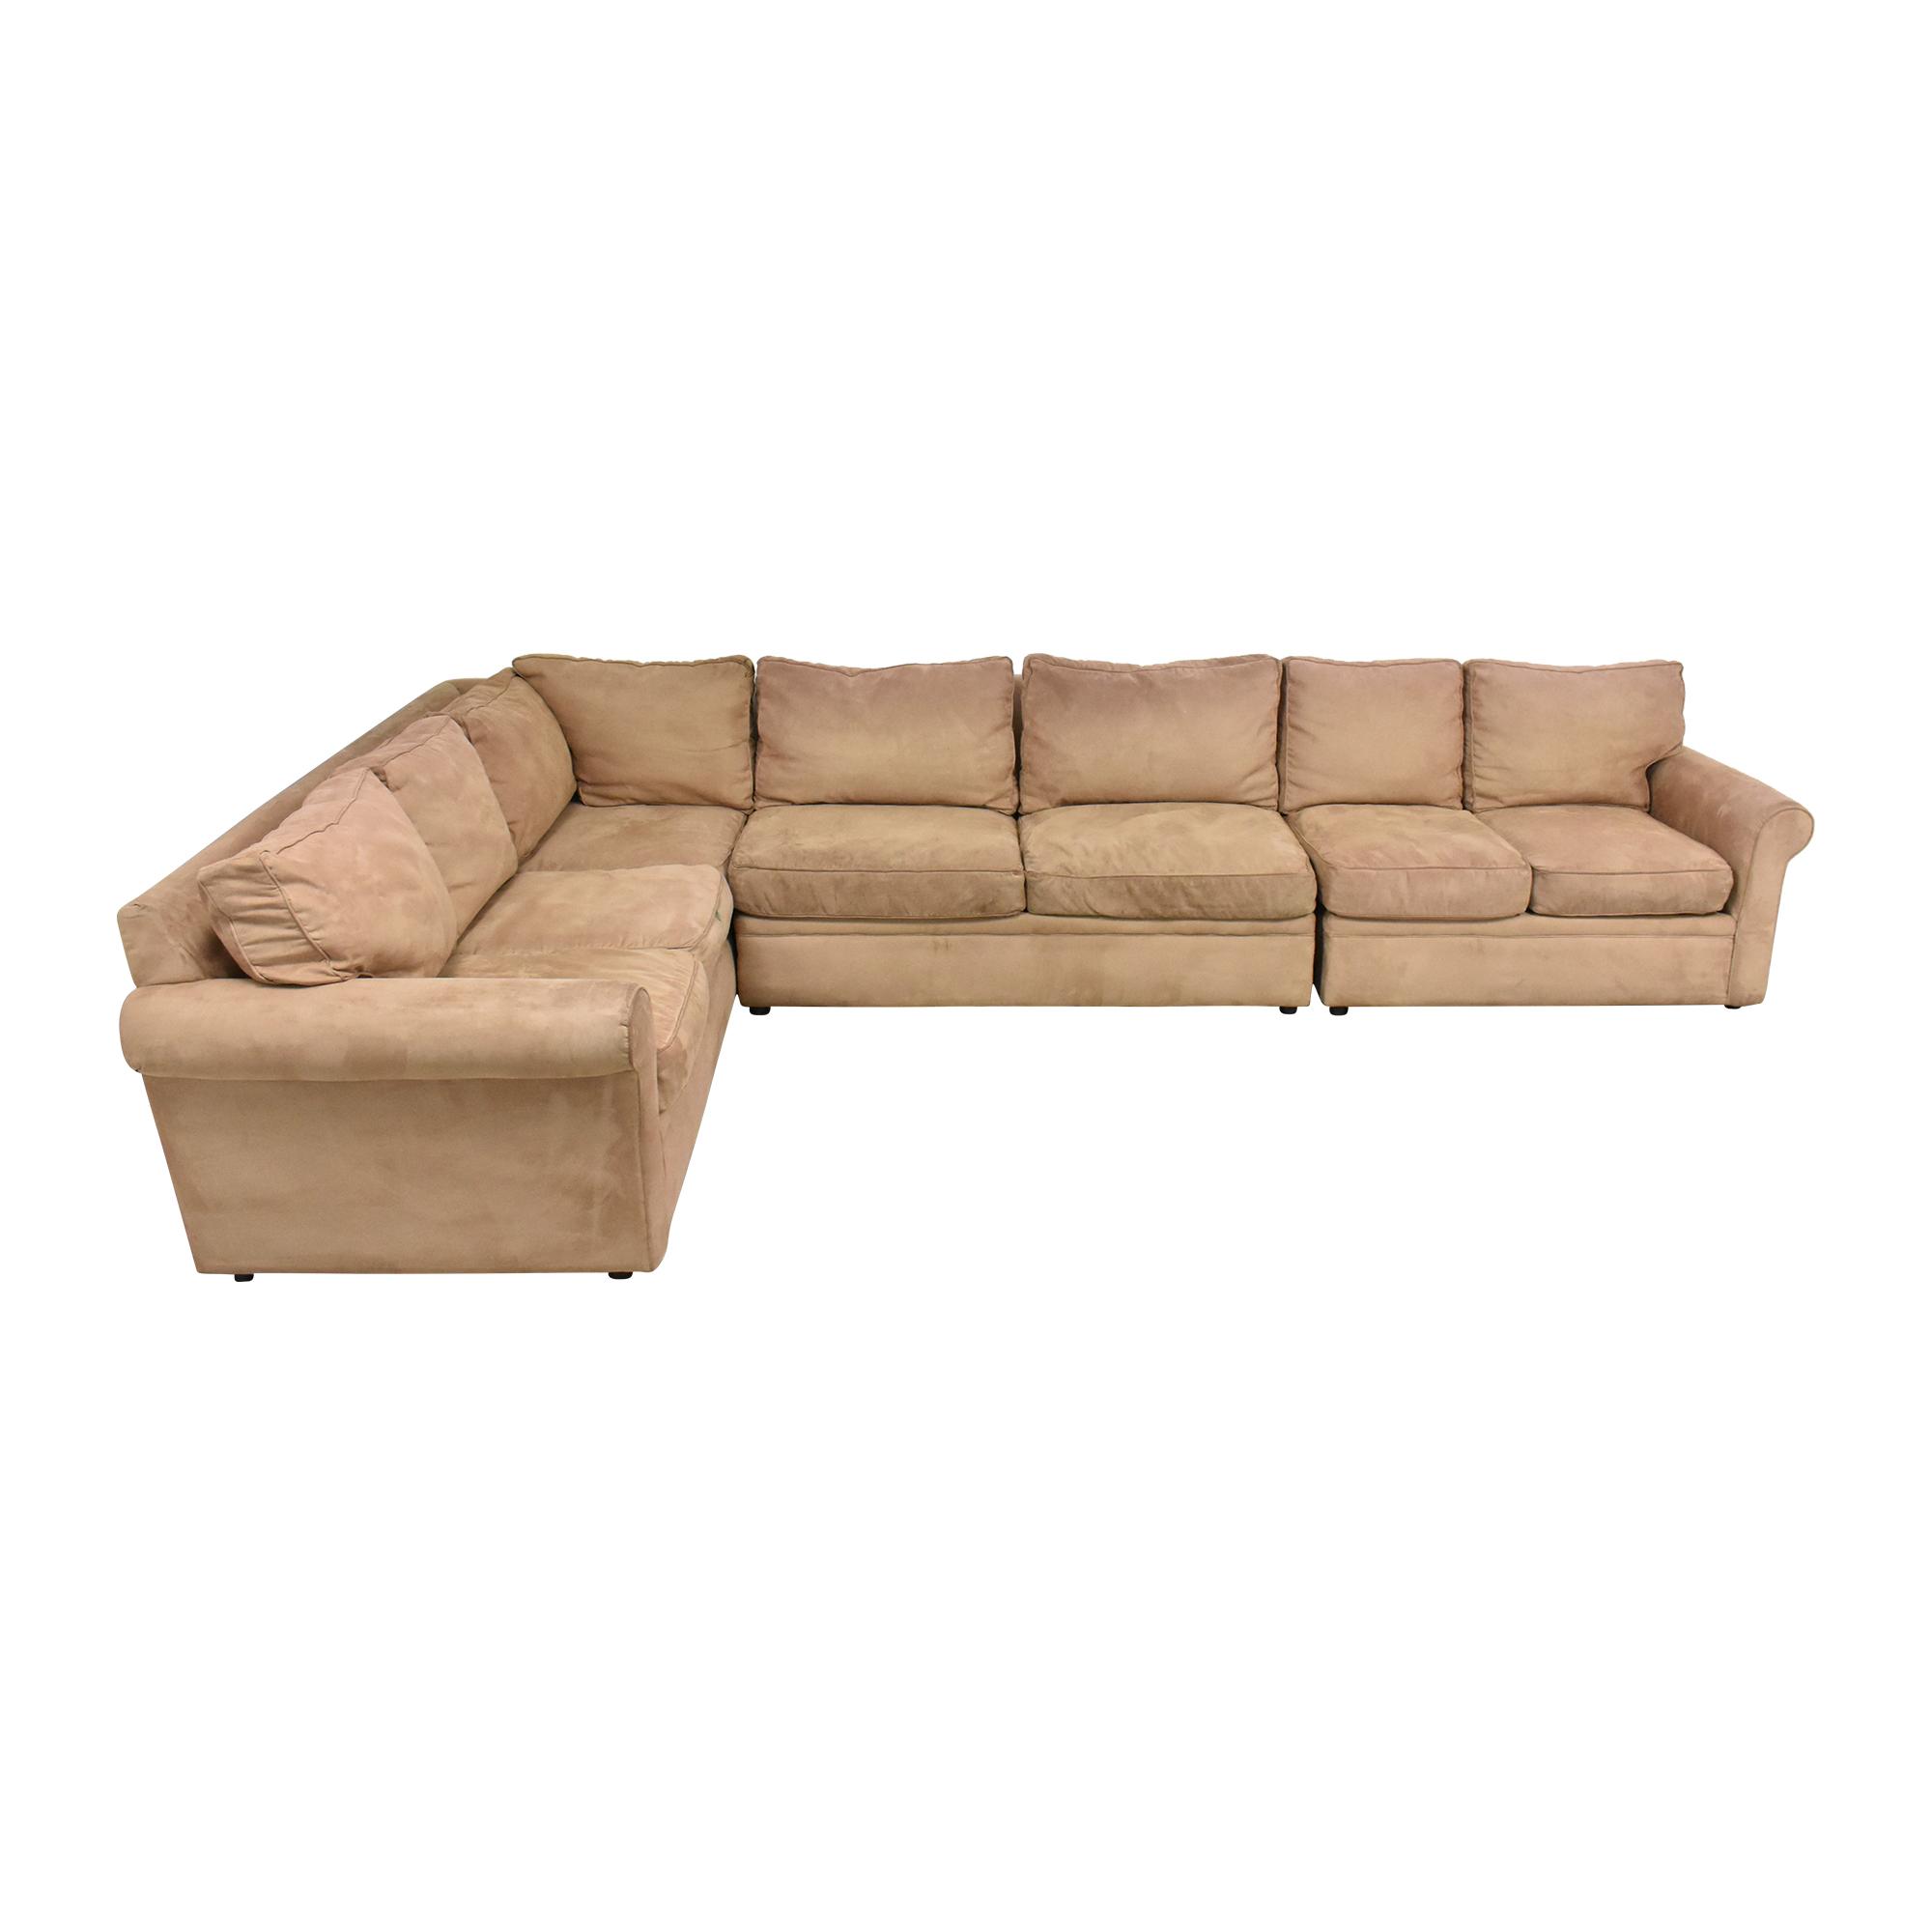 buy Rowe Furniture Corner Sectional Sofa Rowe Furniture Sofas